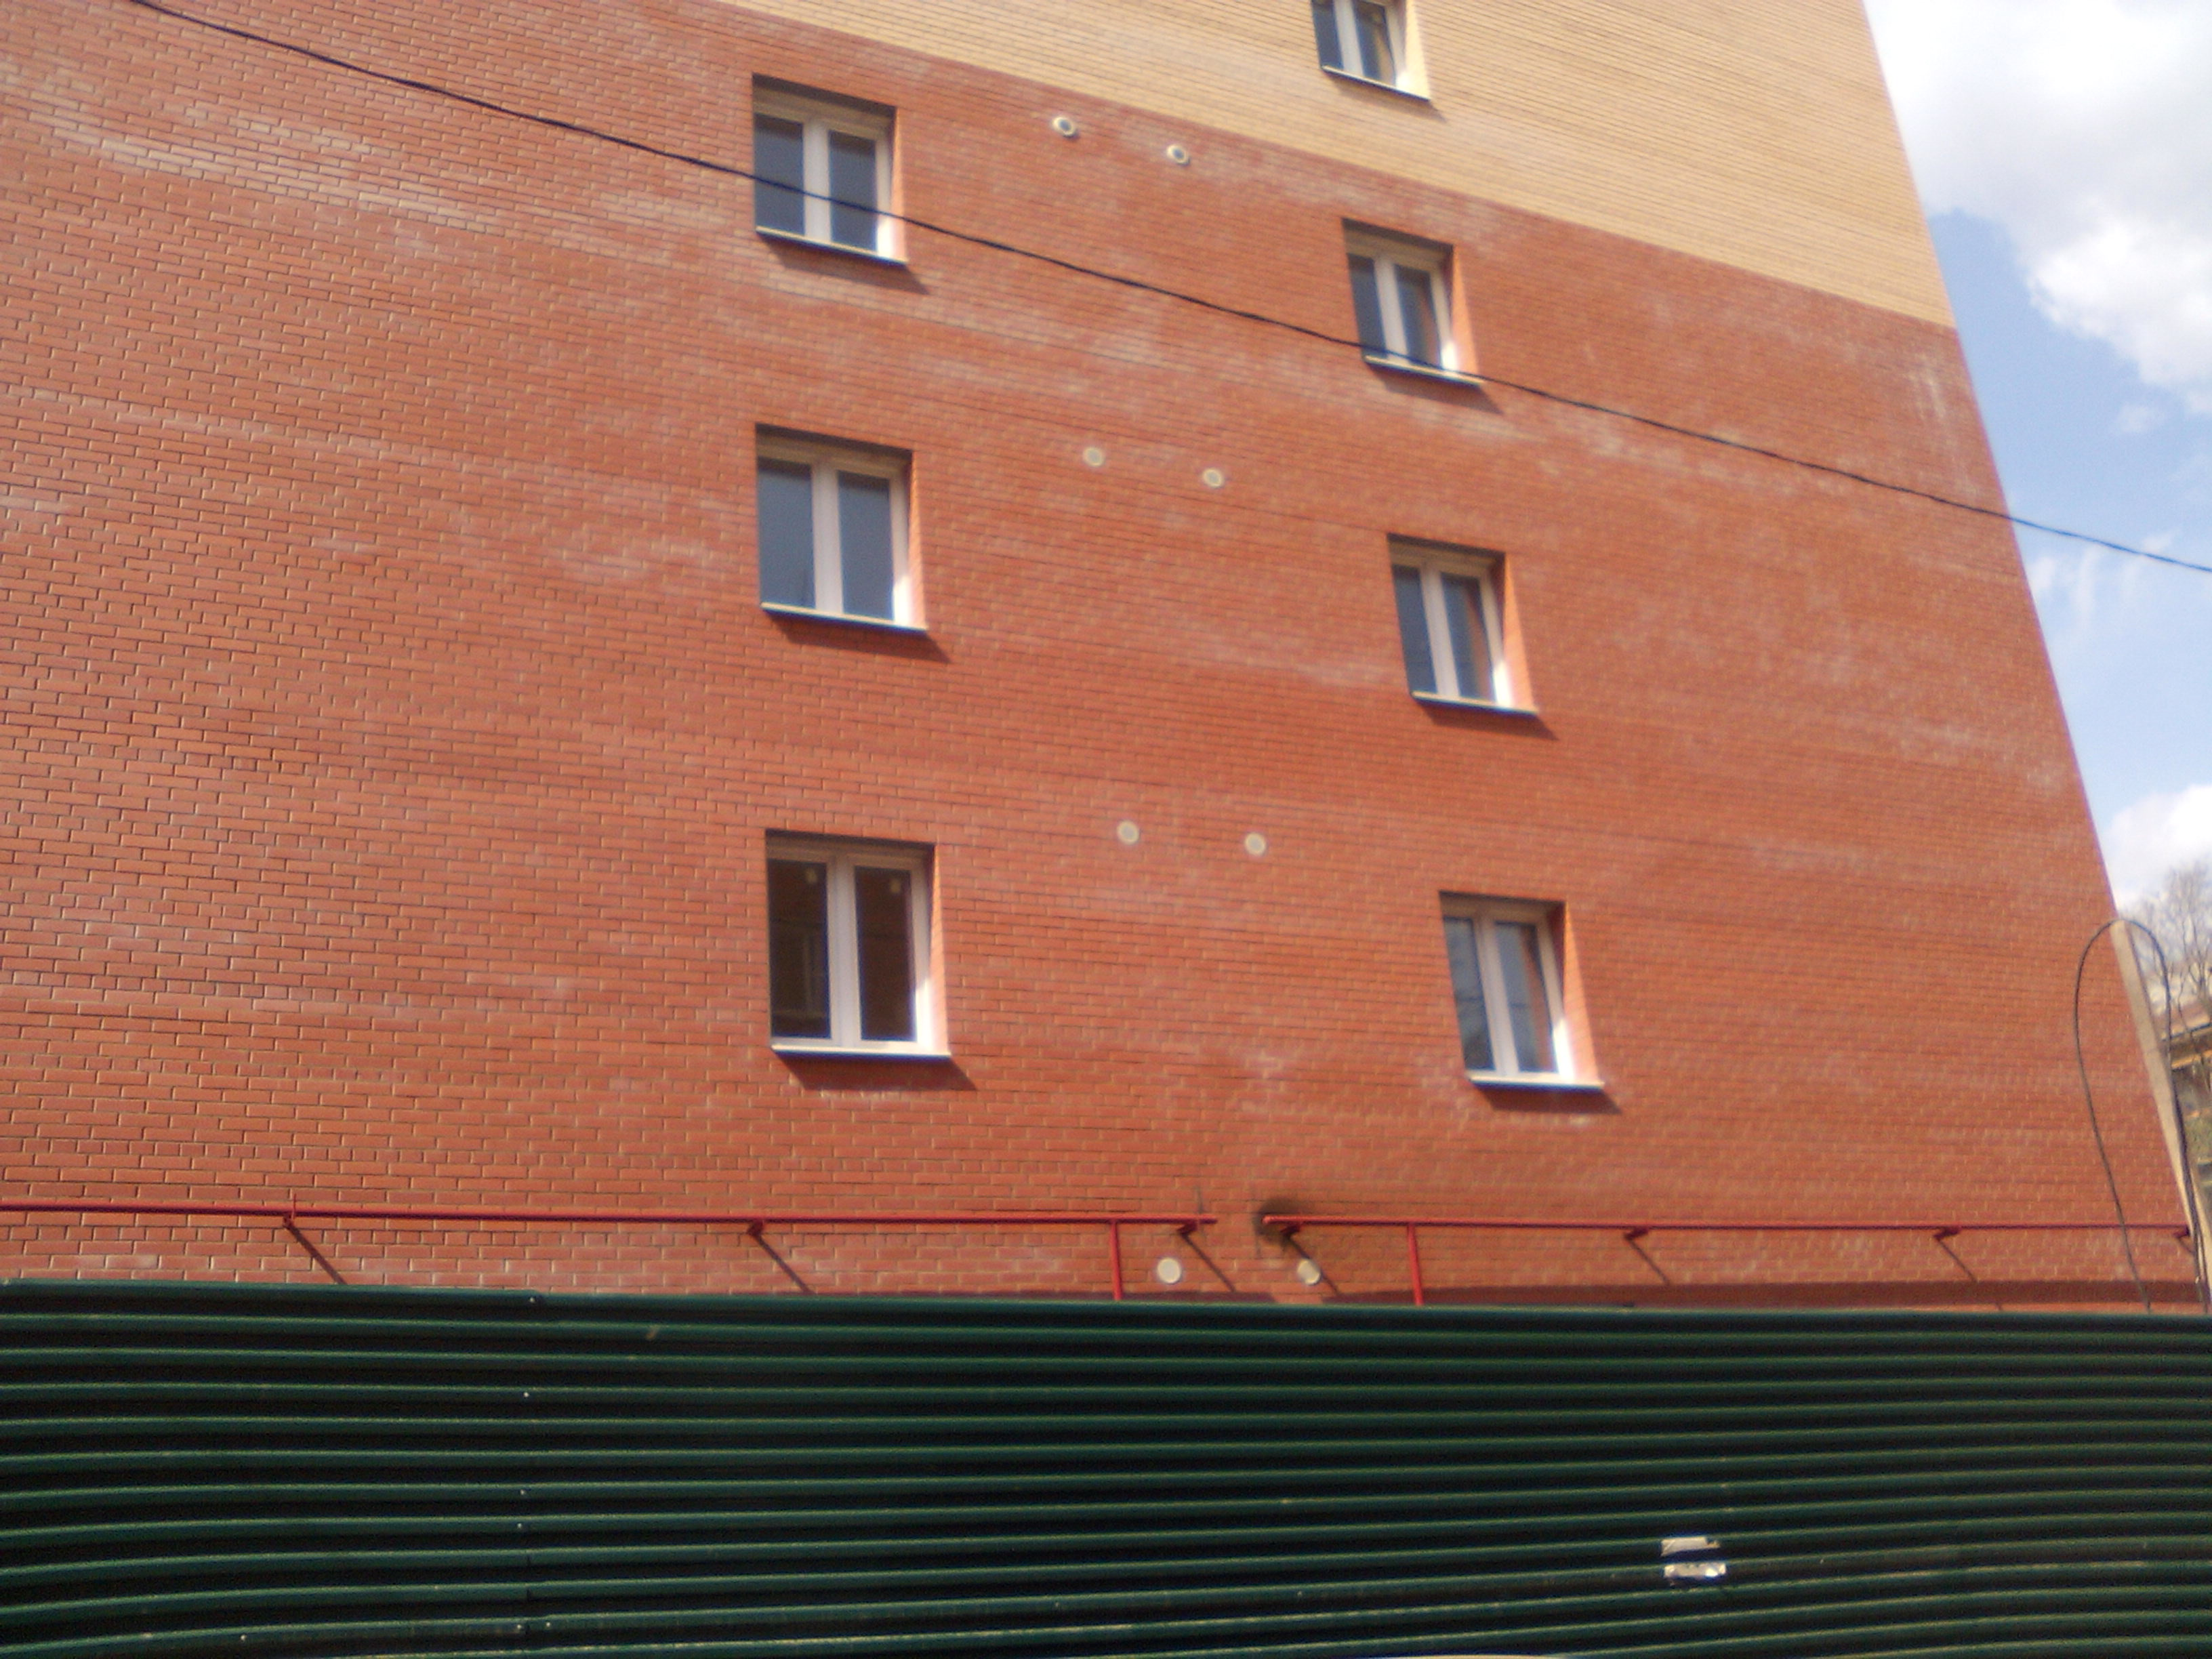 Фотографии жилого дома по улице Баженова г. Тула. ООО Совдел-Строй.